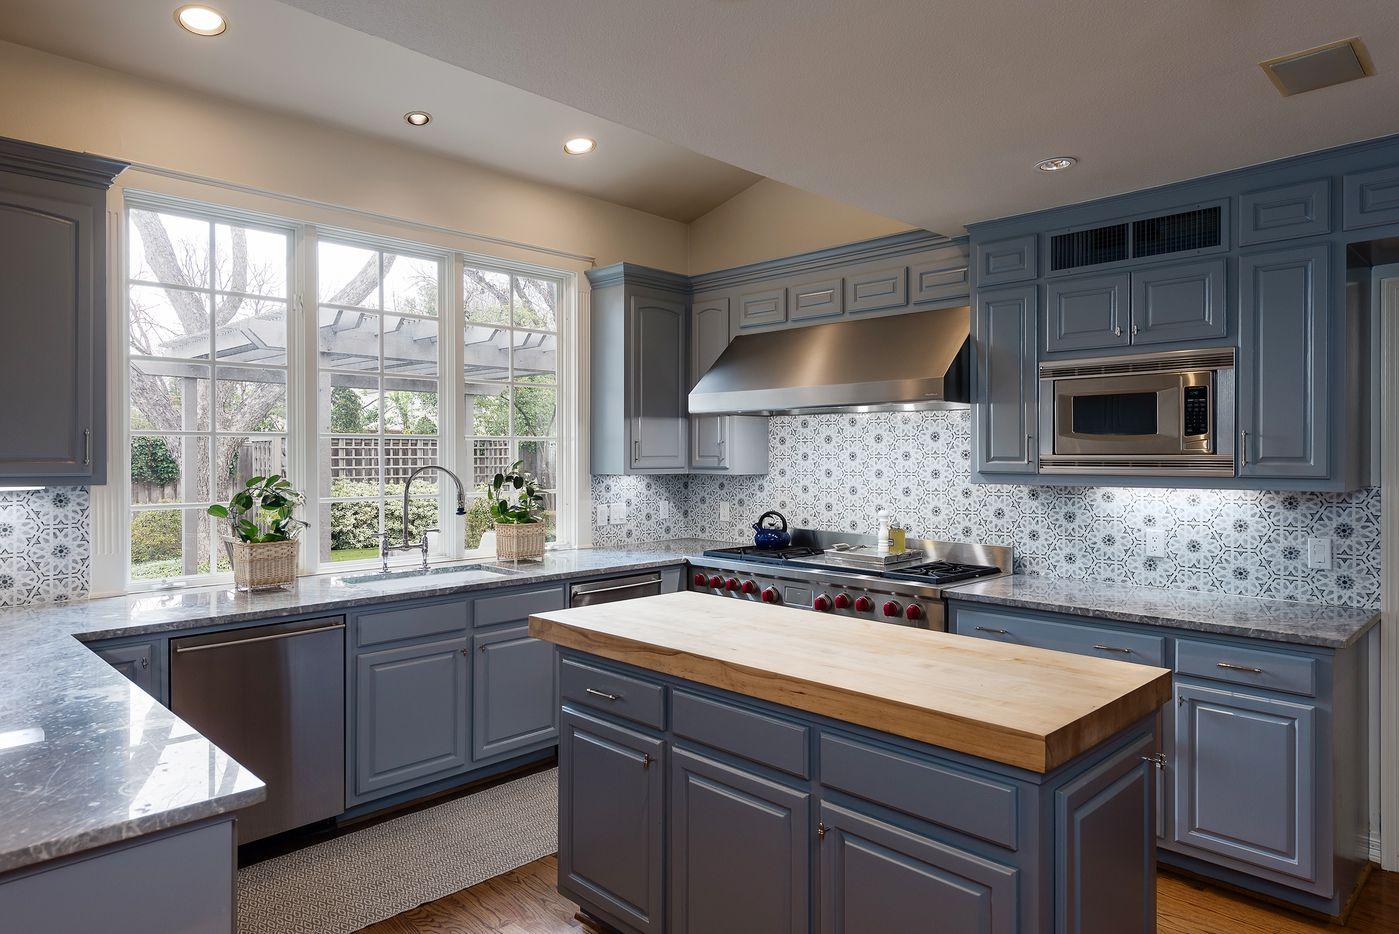 Kitchen at 5845 Lupton Drive.